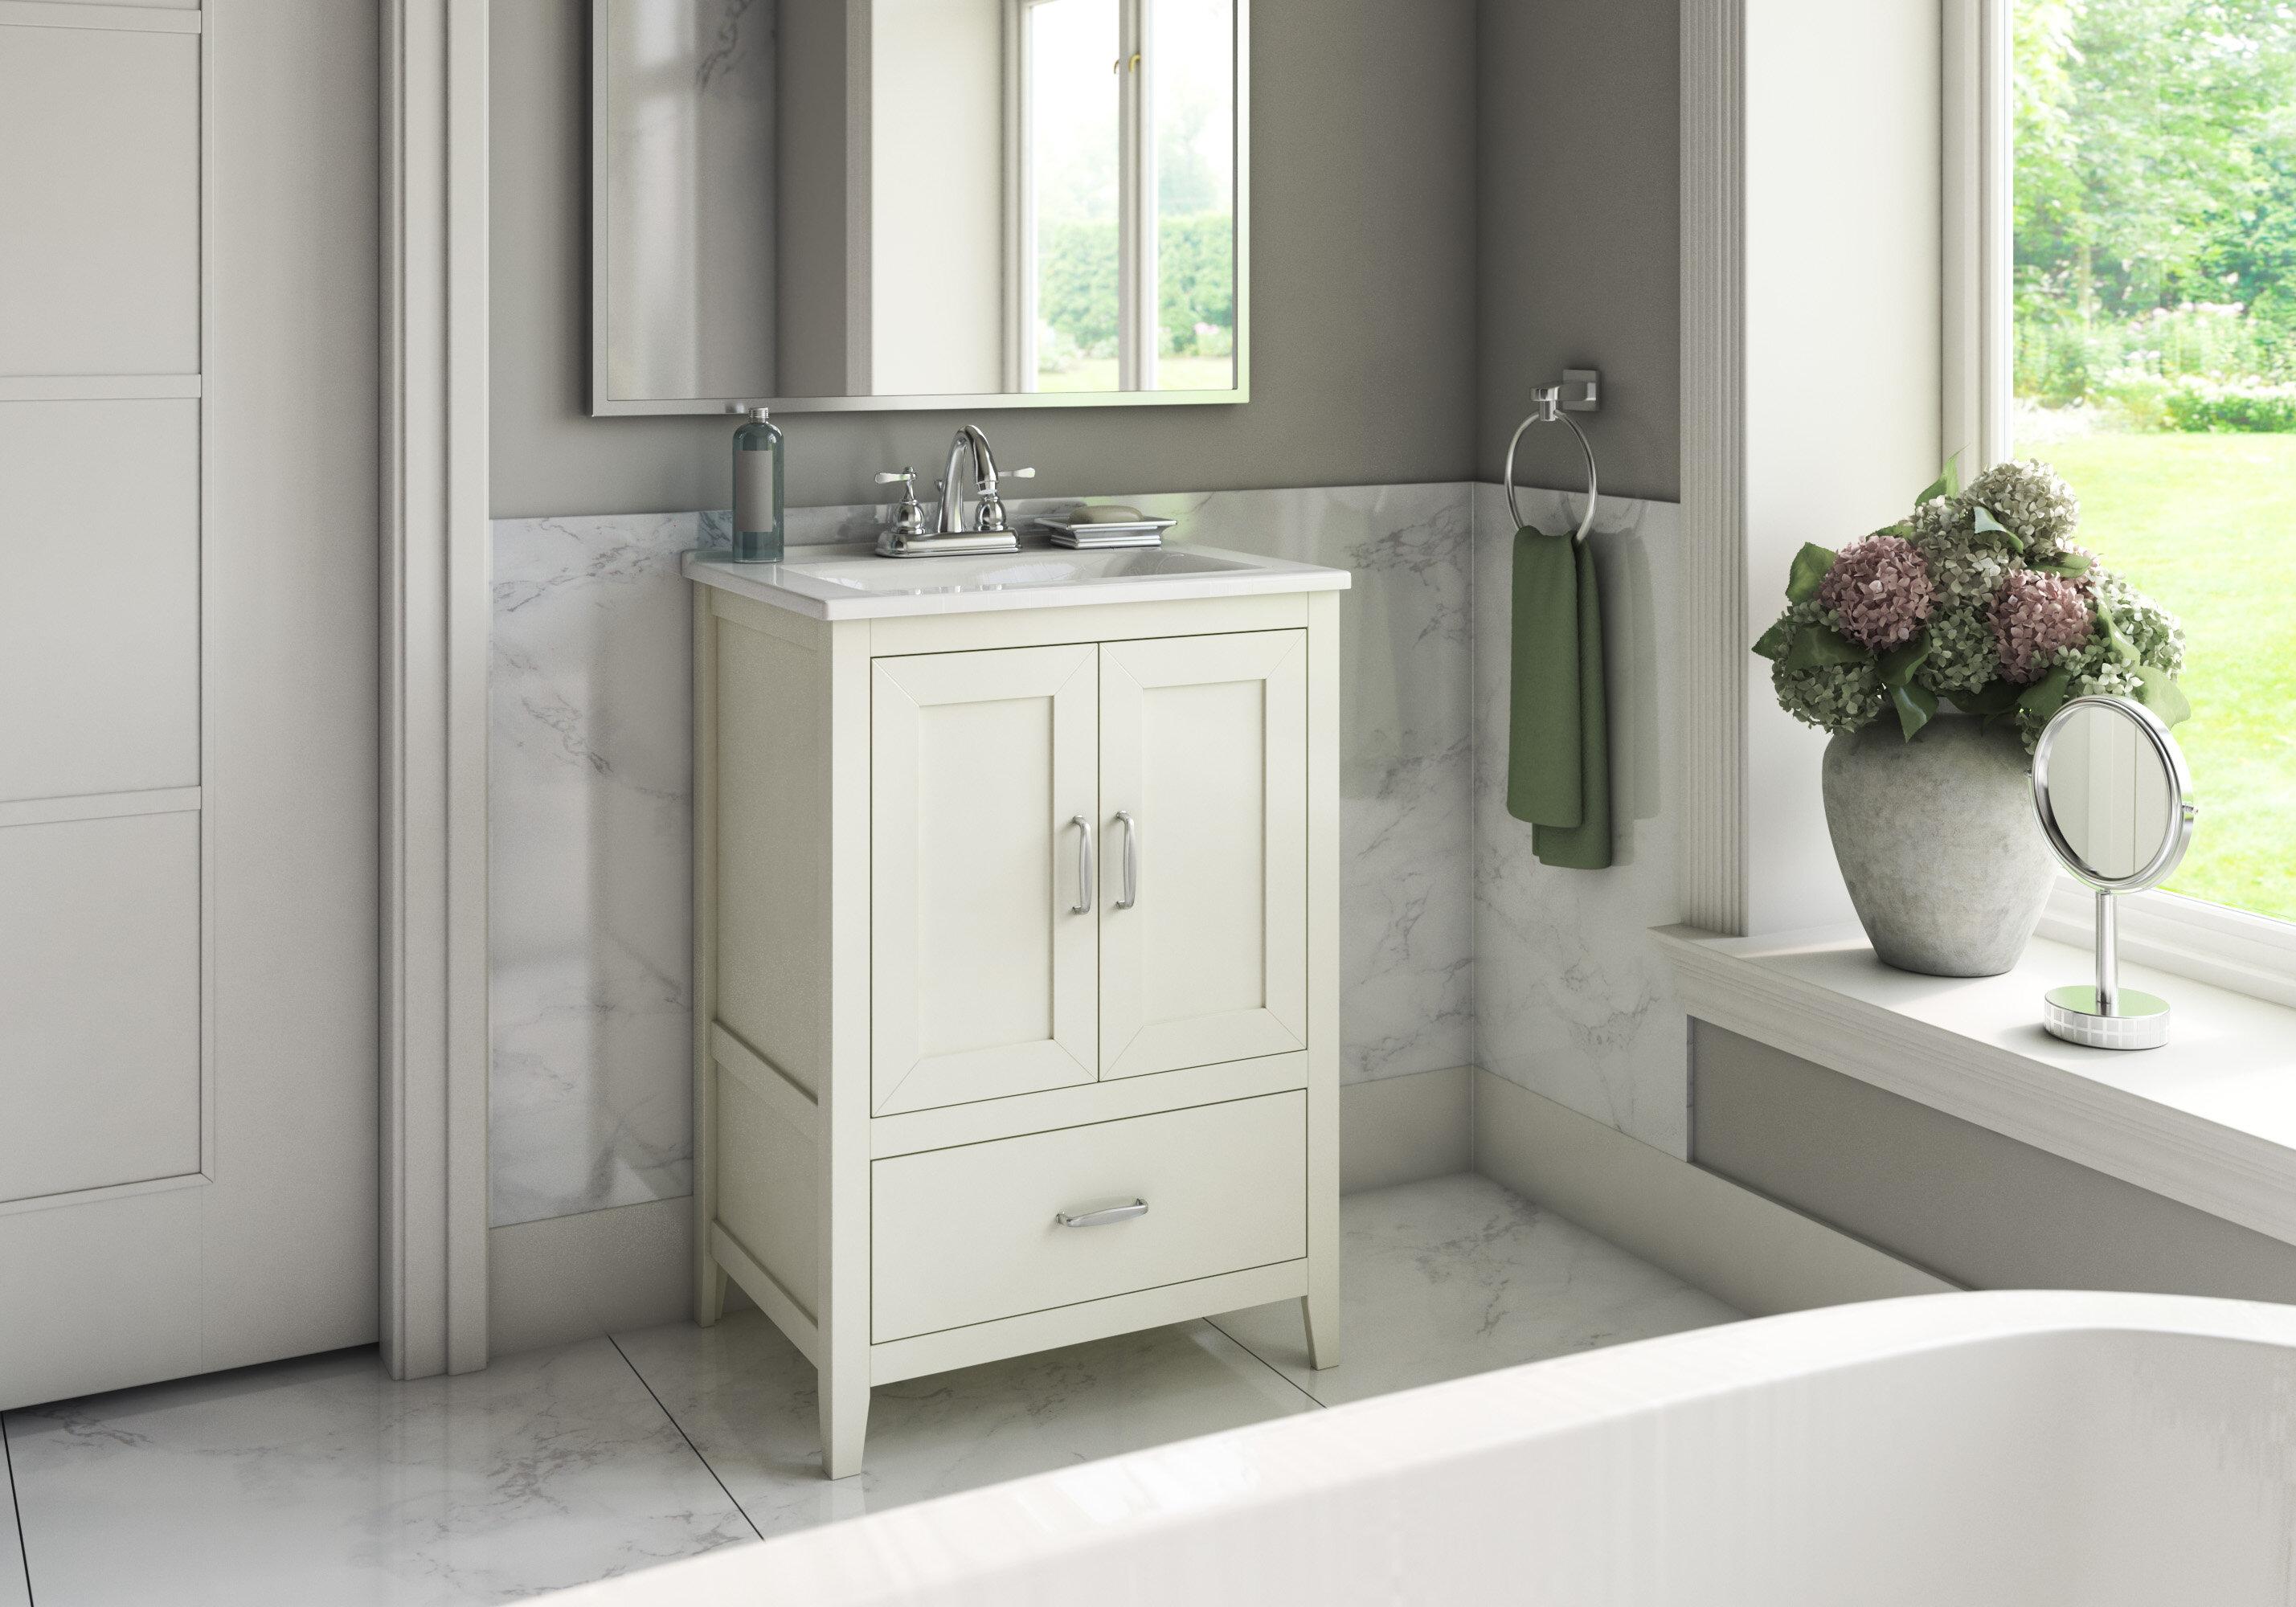 charlton home crist freestanding style 24 single sink bathroom rh wayfair com freestanding bathroom vanity units uk freestanding bathroom vanity units uk